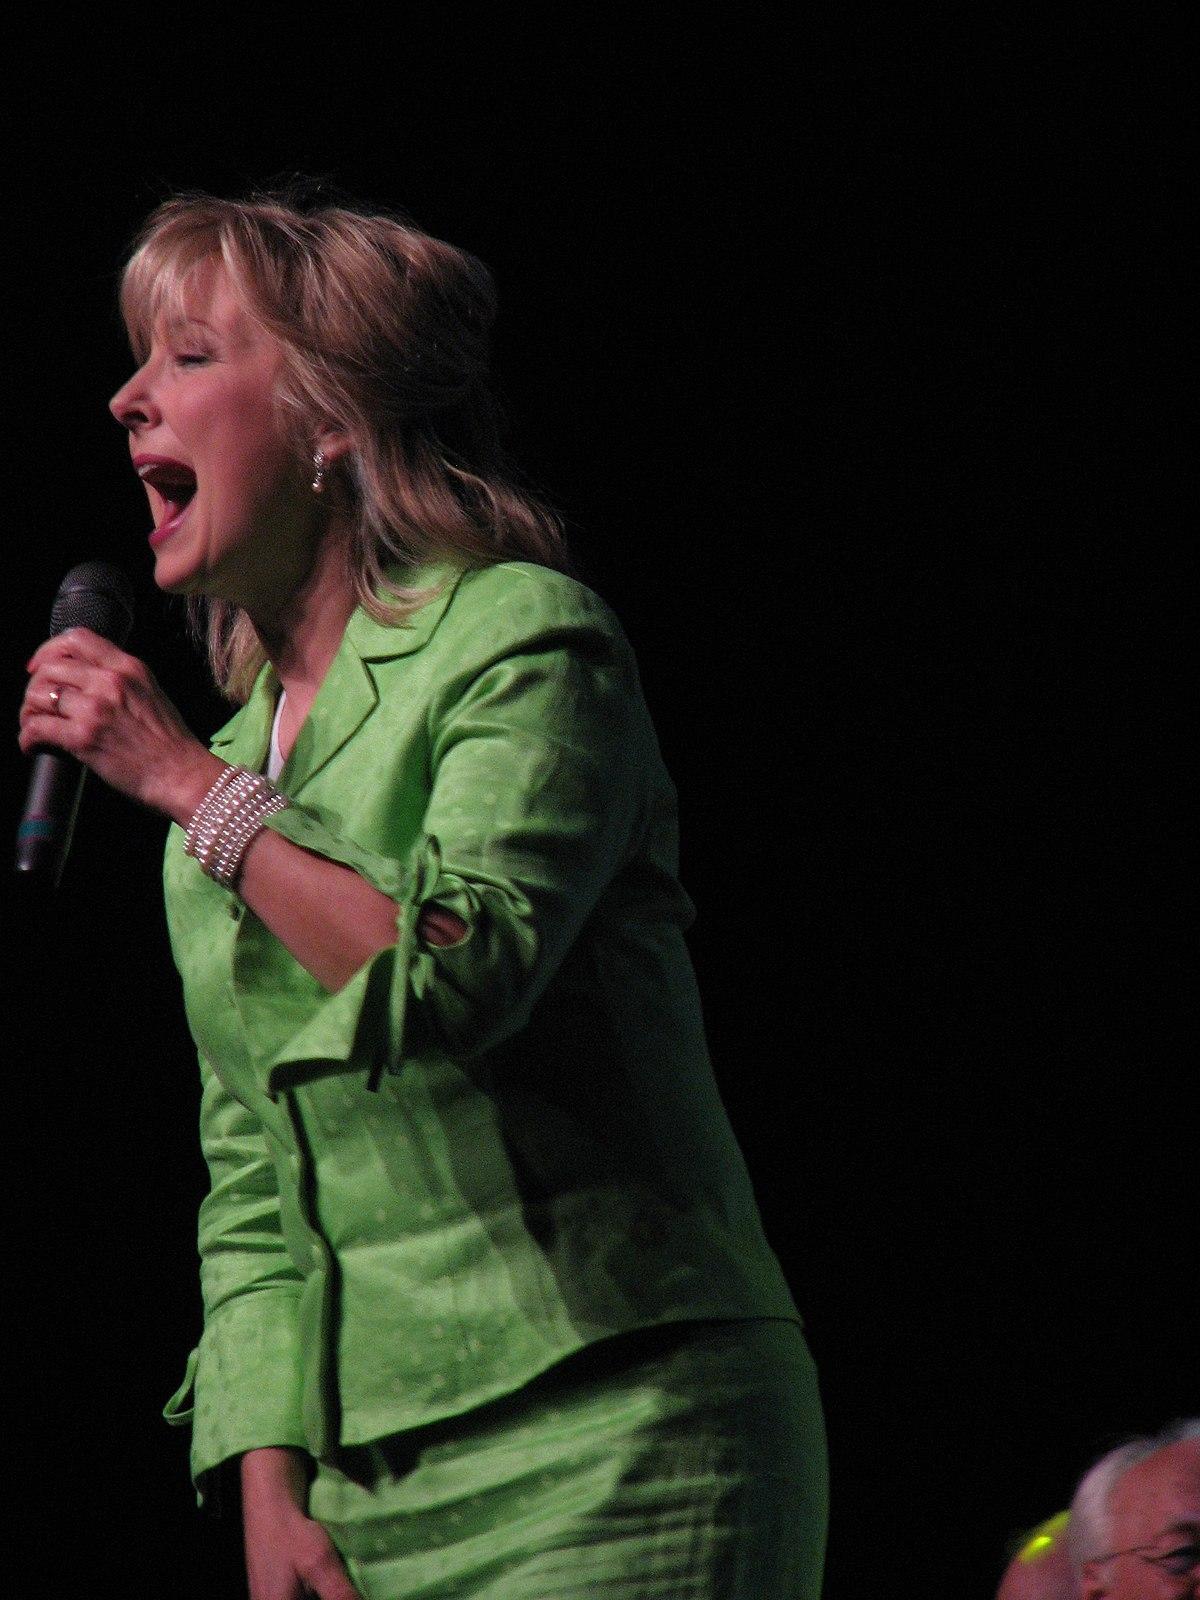 janet paschal wikipedia - Candy Christmas Gospel Singer